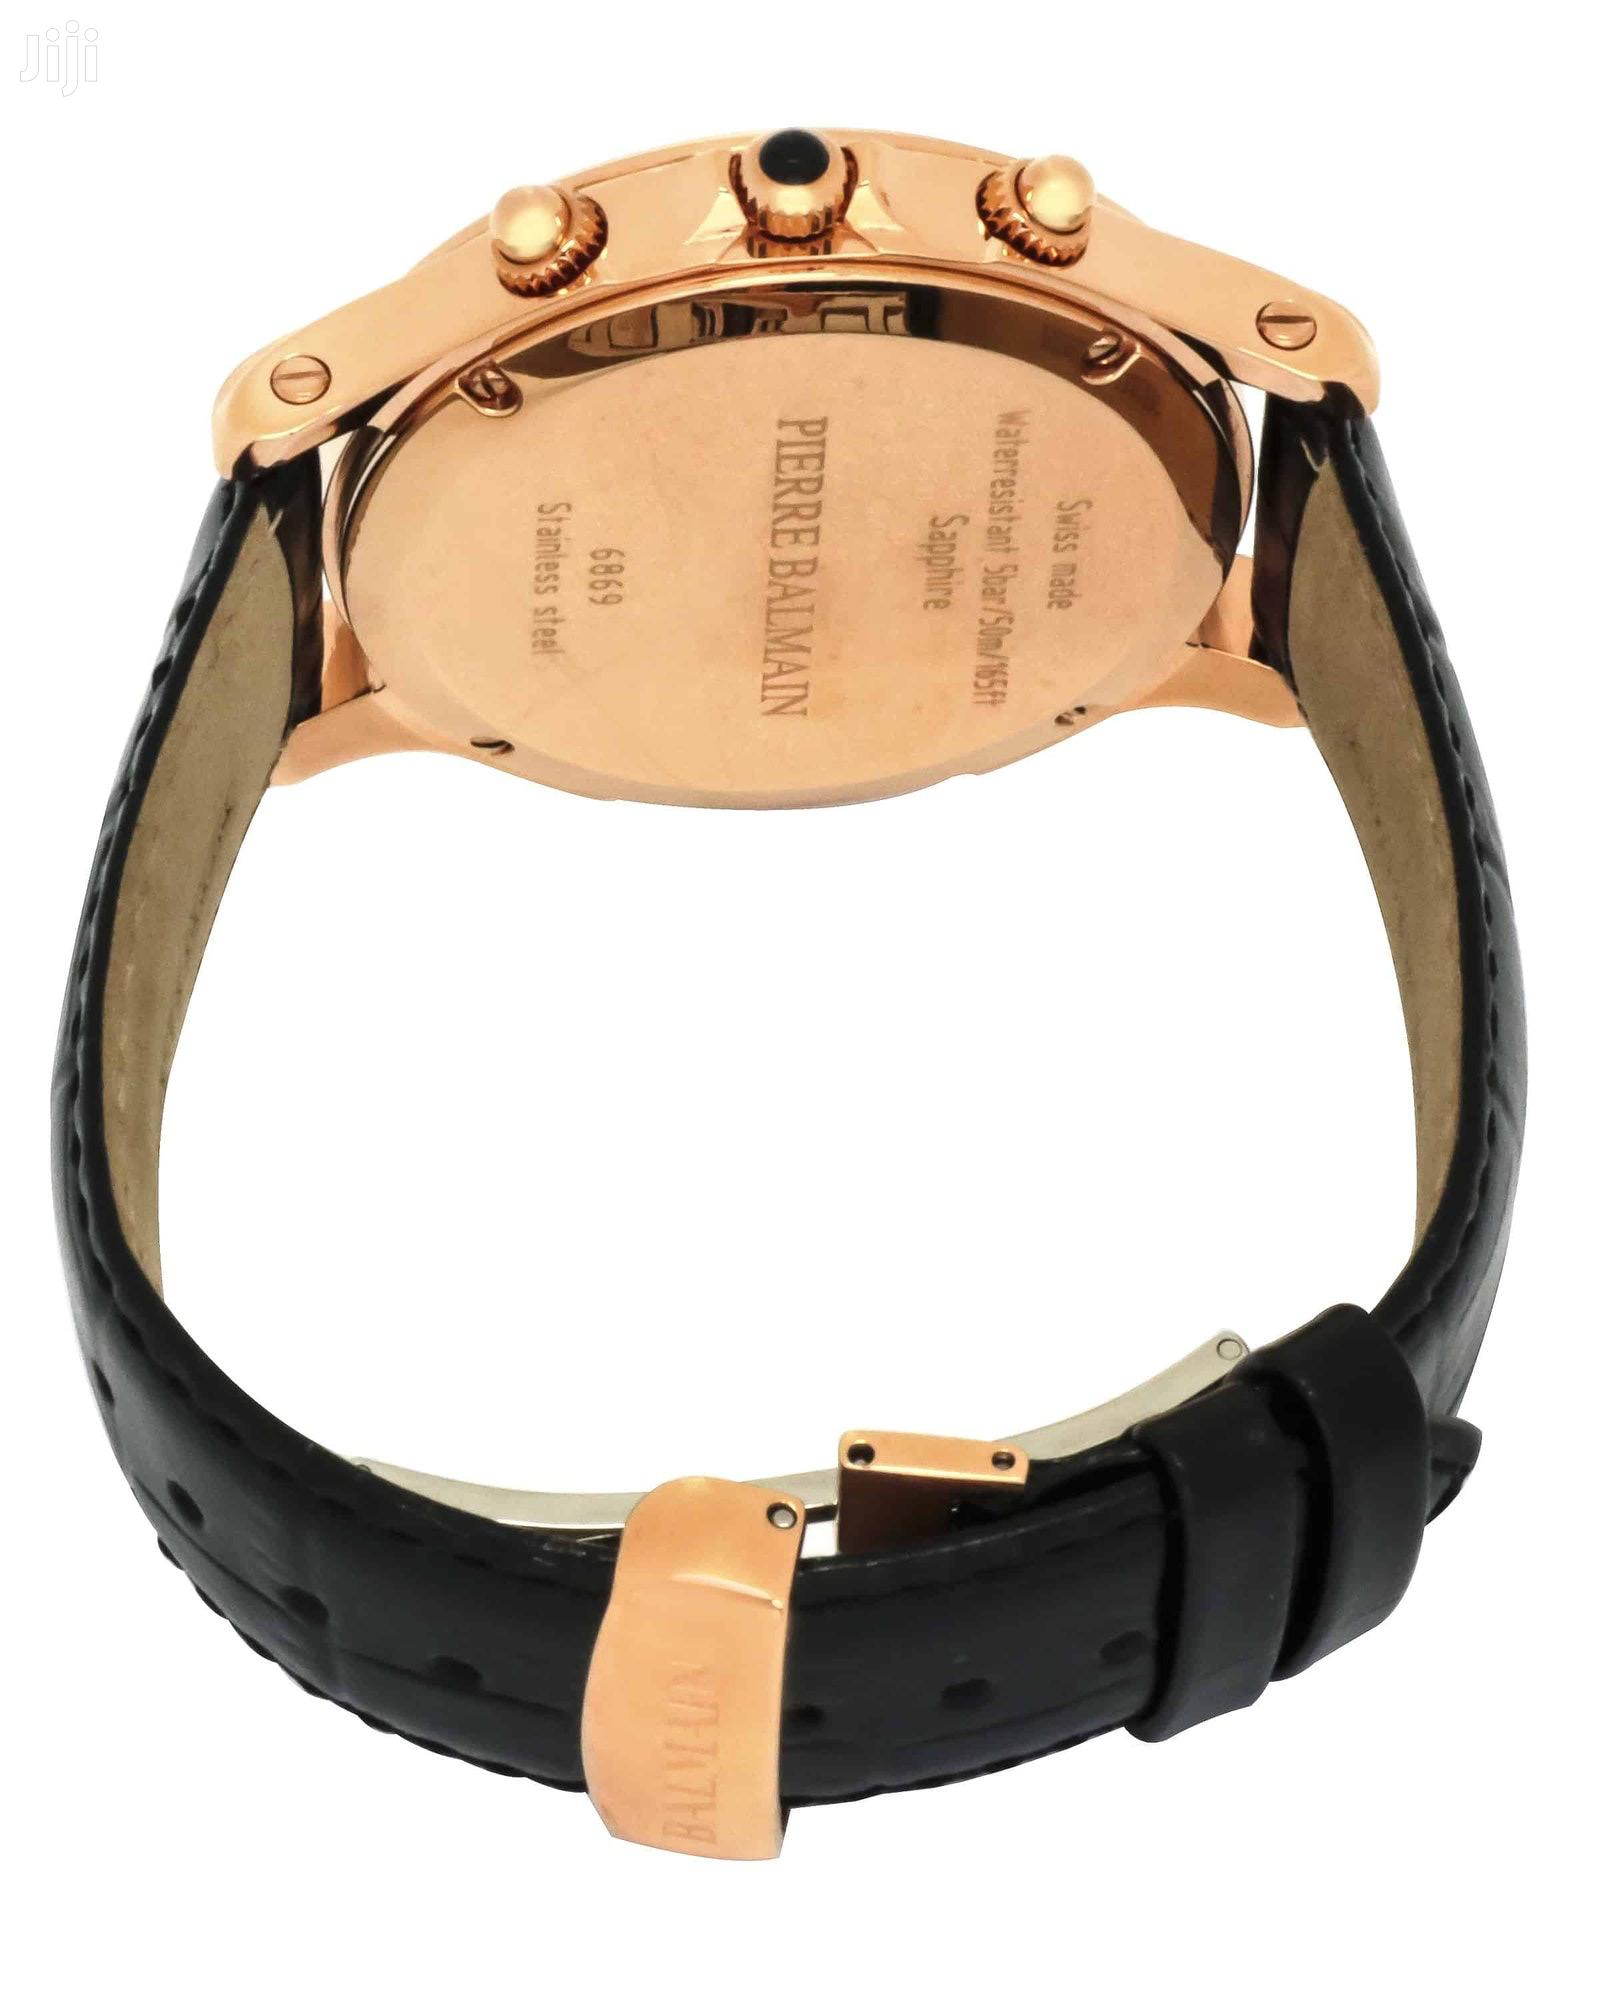 Balmain Eria Chrono Gent Round Men's Quartz Watch | Watches for sale in Abelemkpe, Greater Accra, Ghana